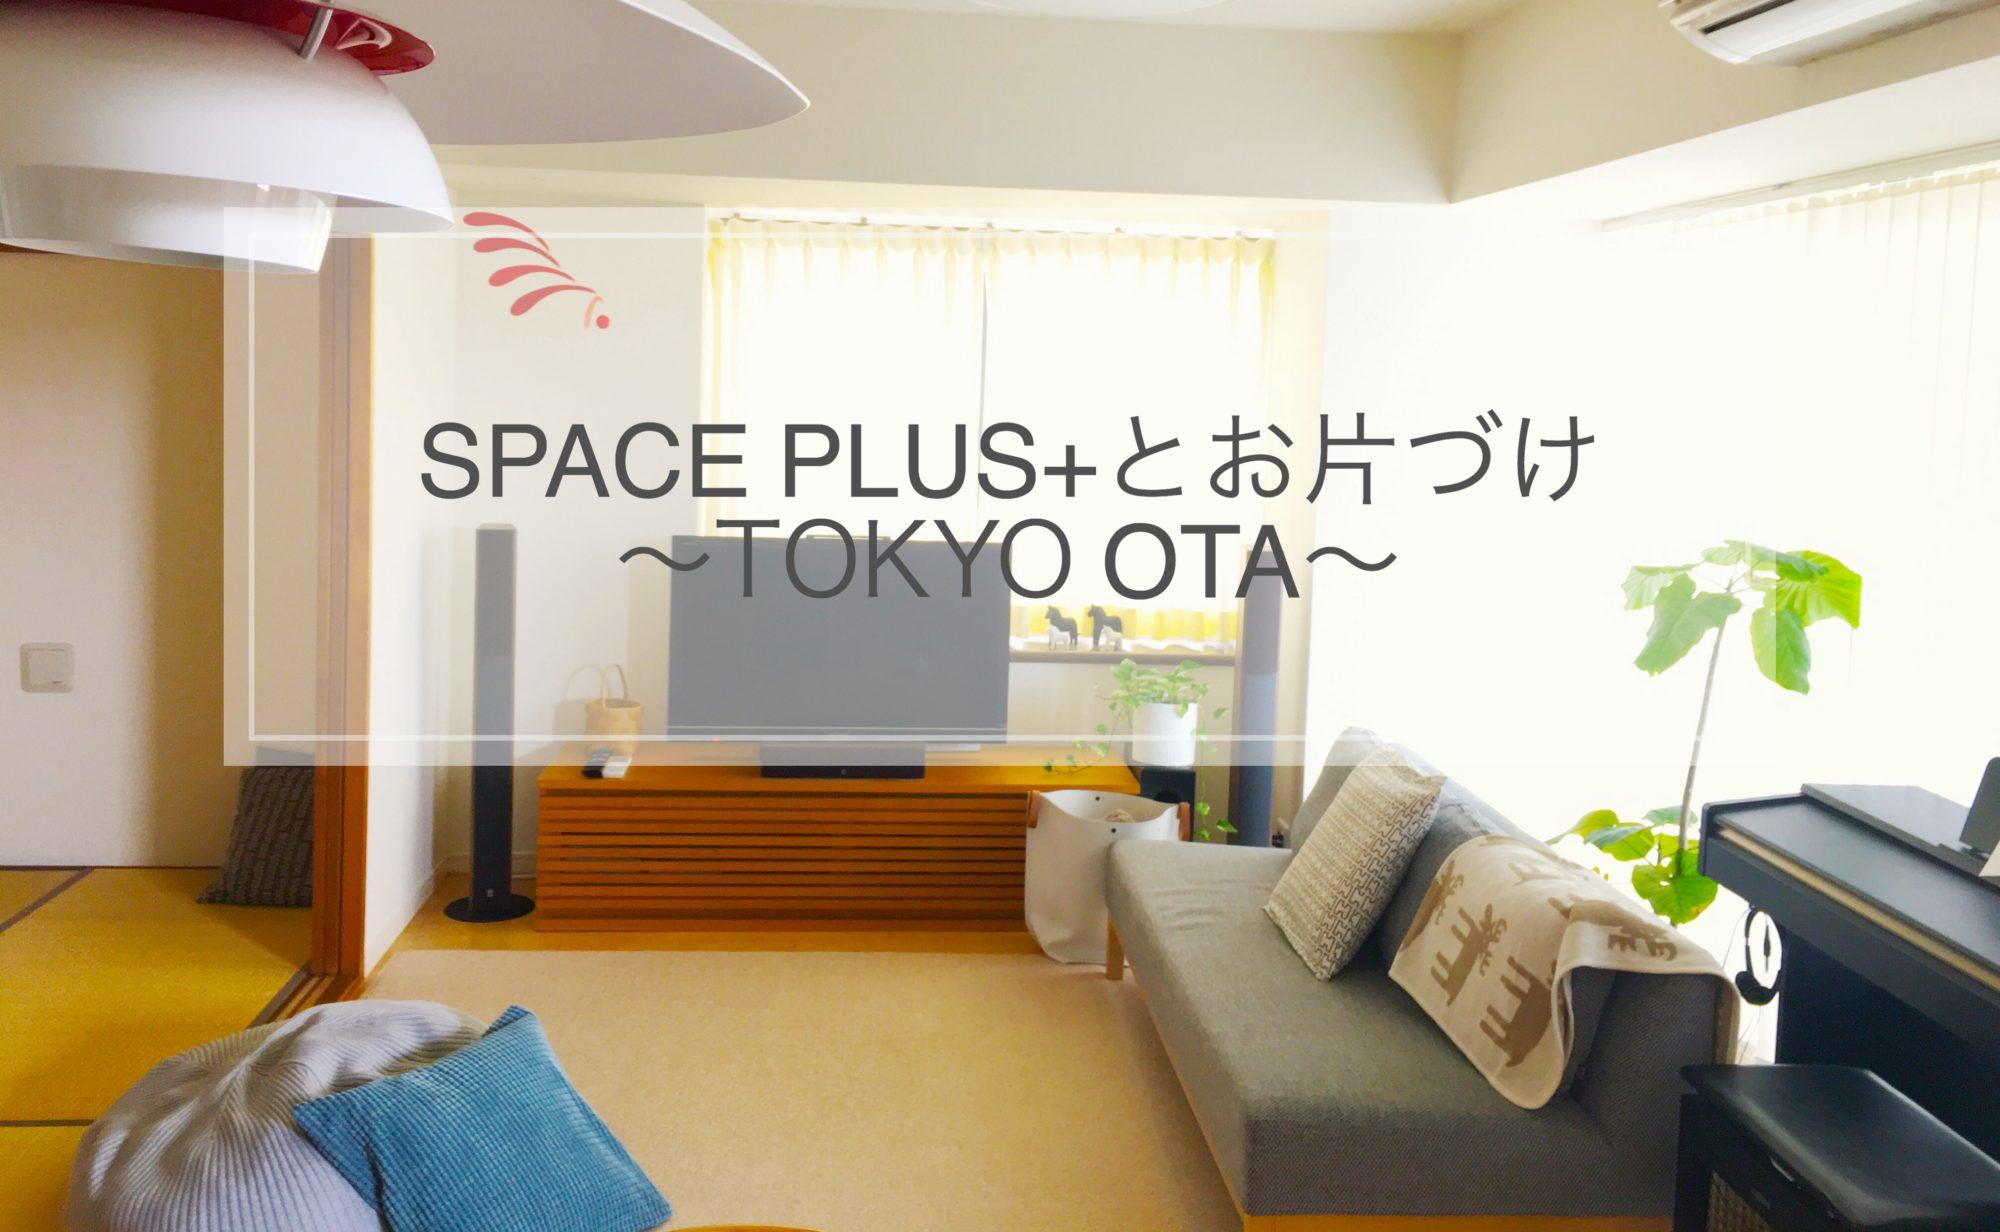 SPACE PLUS+とお片付け~ 東京大田区~